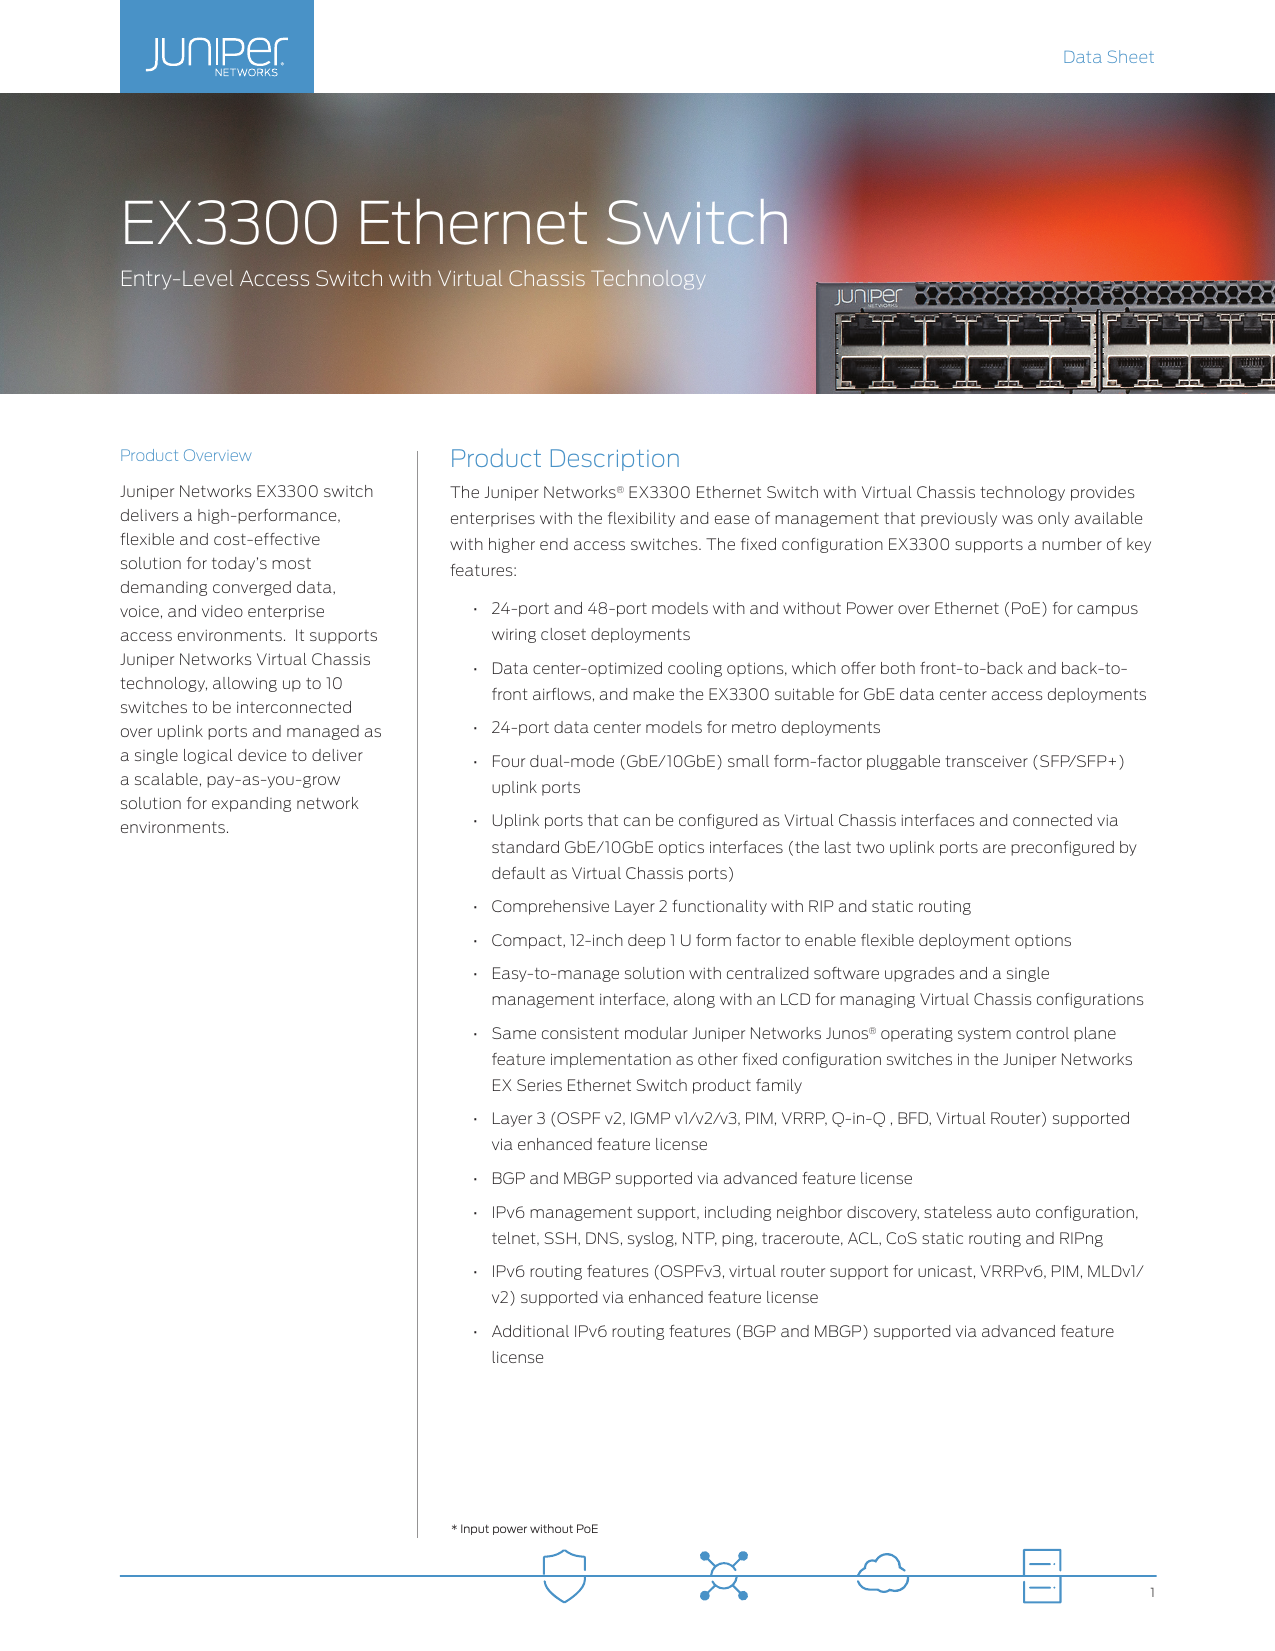 EX3300 Ethernet Switch